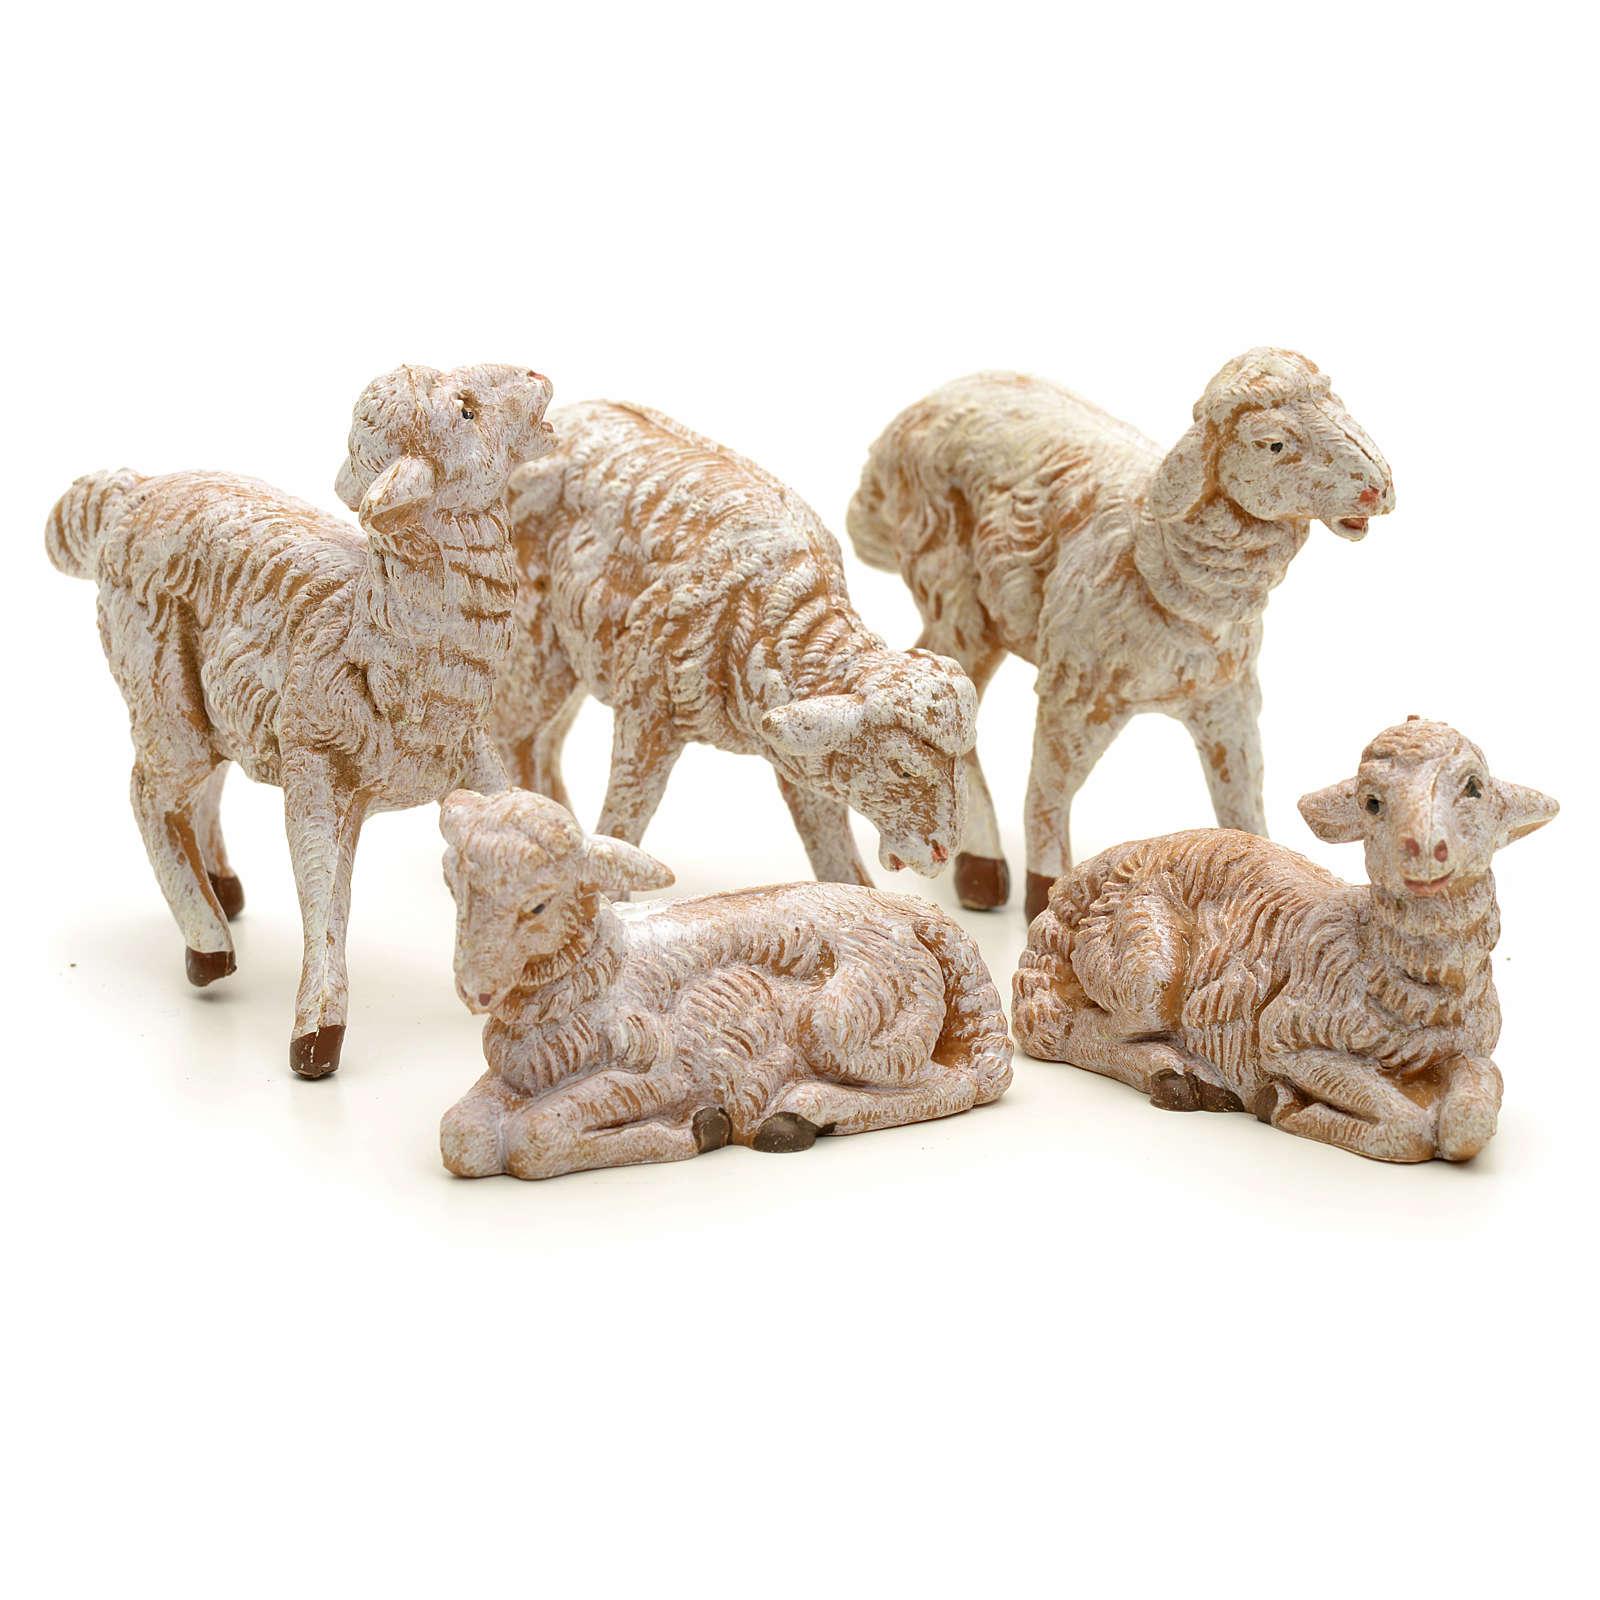 Owce szopka 12 cm Fontanini 5 szt 4